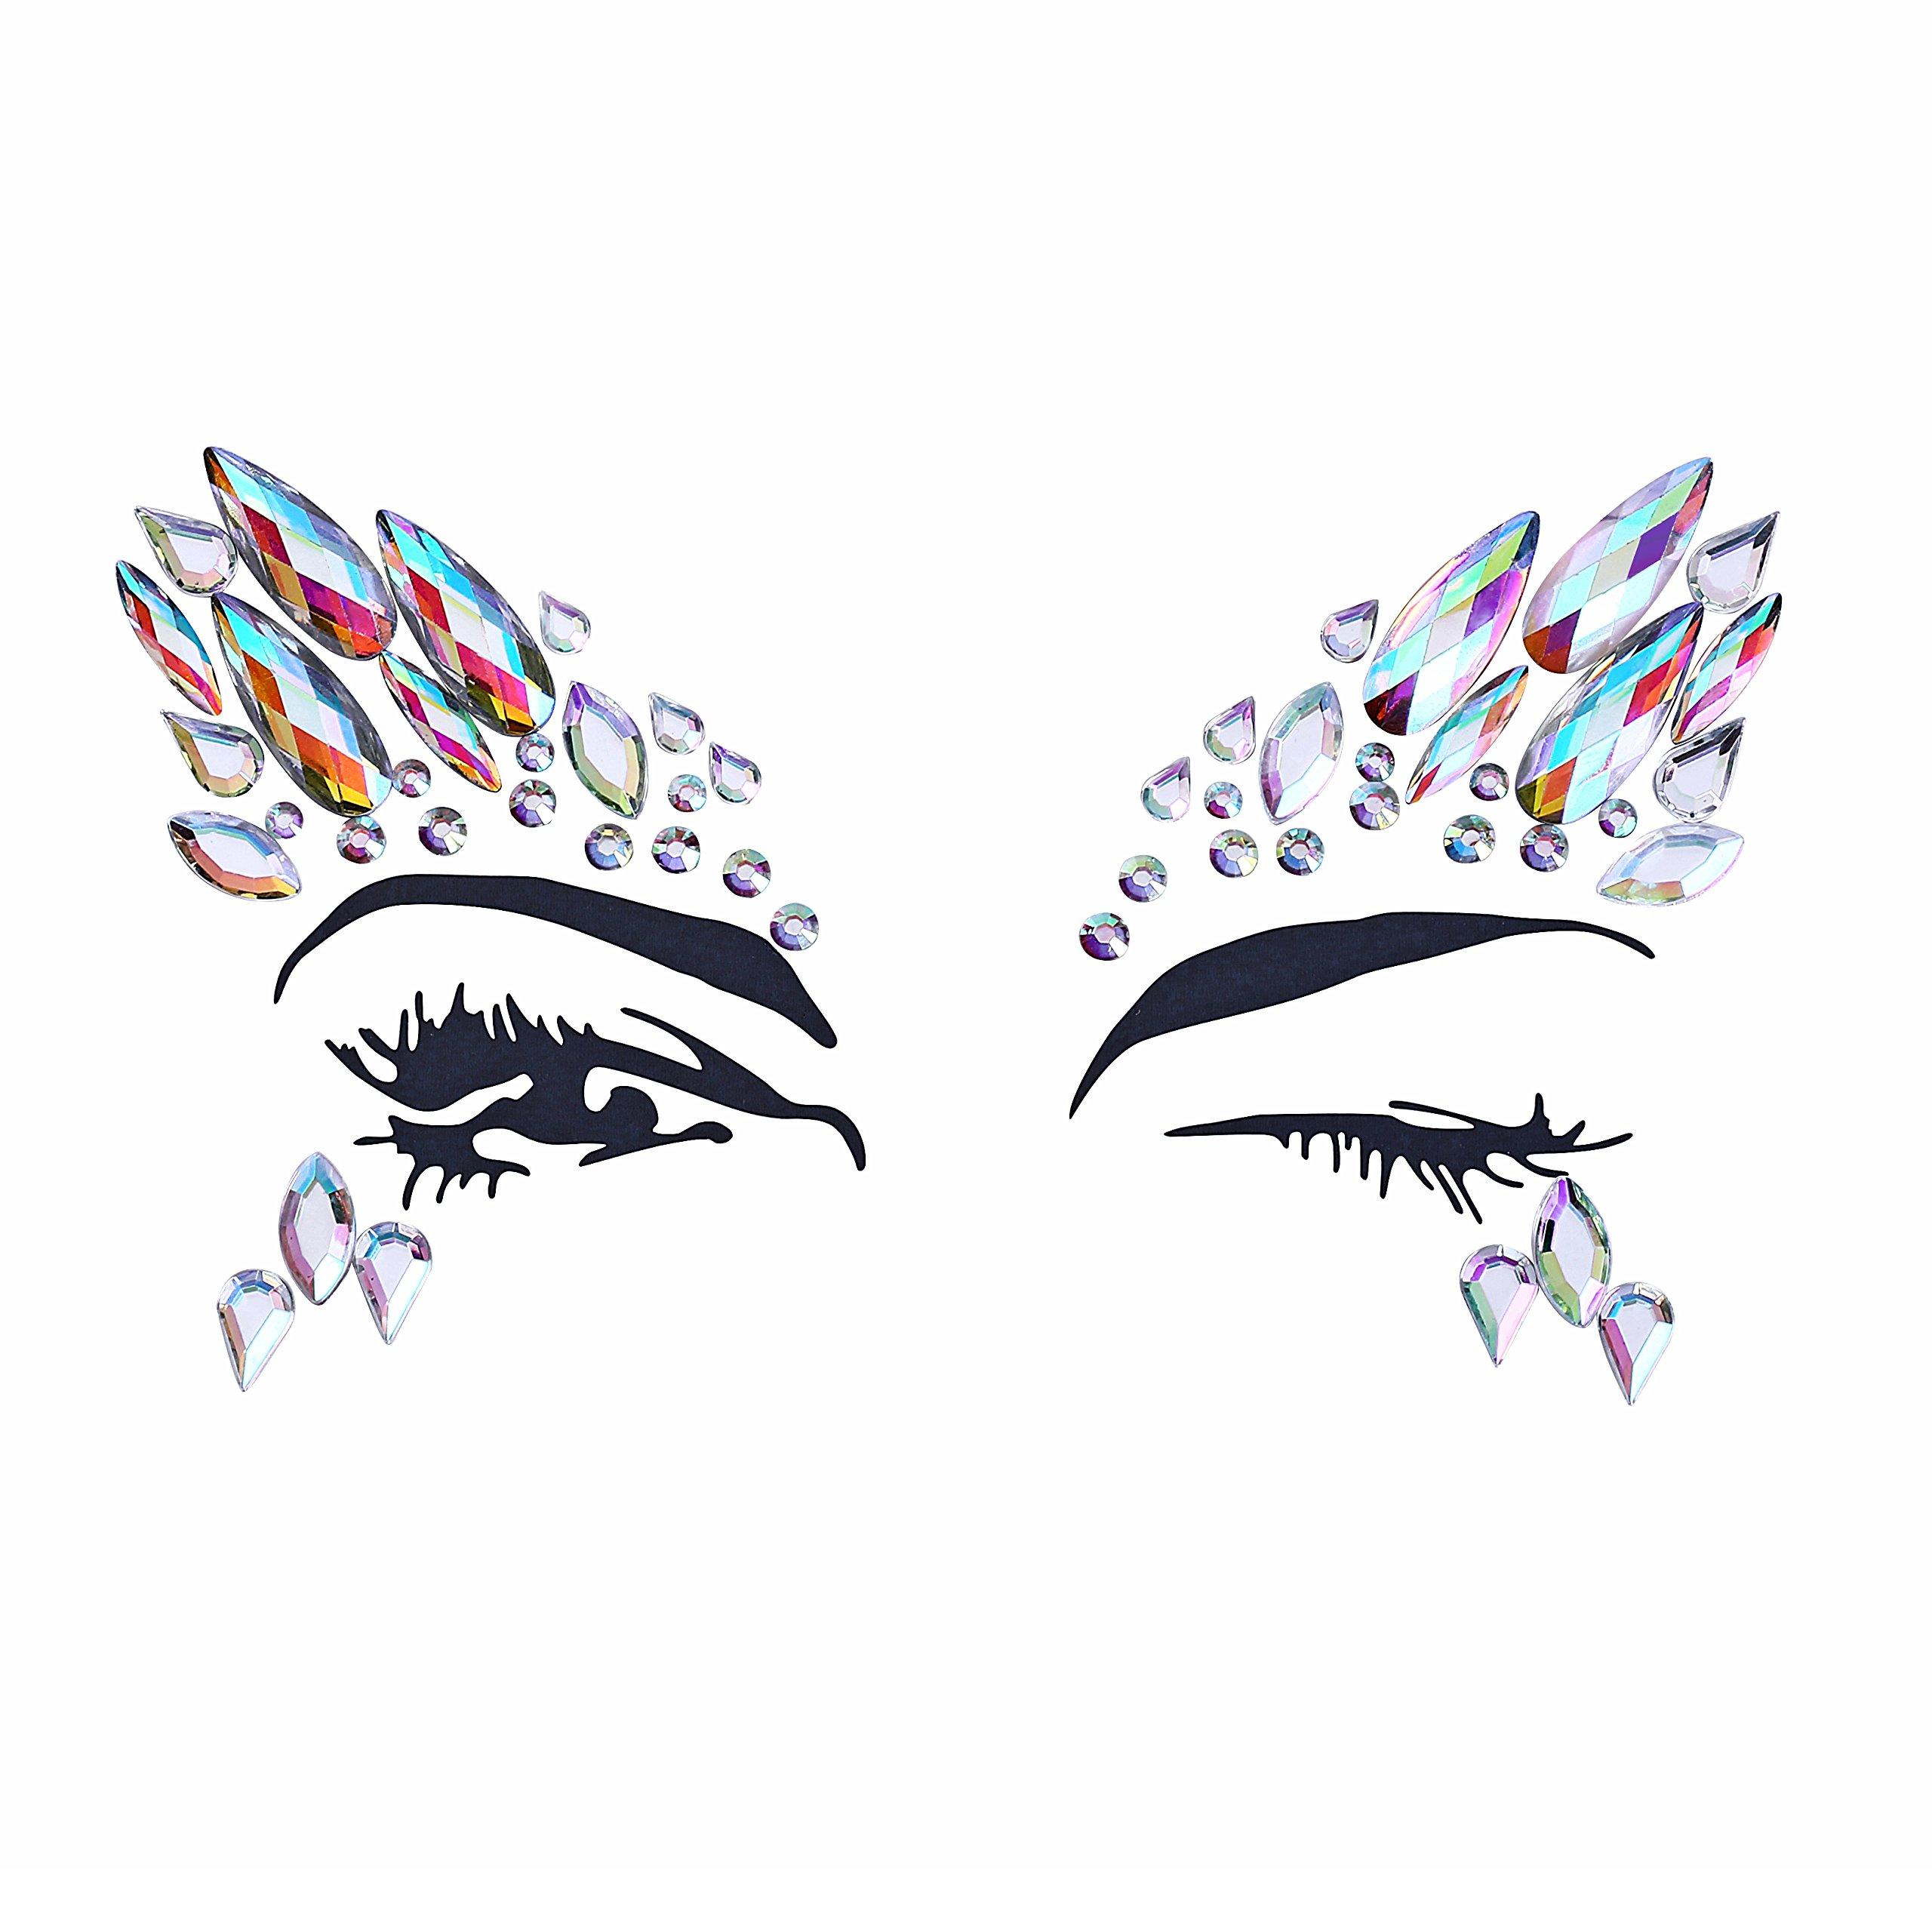 8 Sets Women Gems Glitter Rhinestone Mermaid Face Jewels Tattoo Crystal Tears Gem Stones Bindi Temporary Stickers by du fangbin (Image #3)